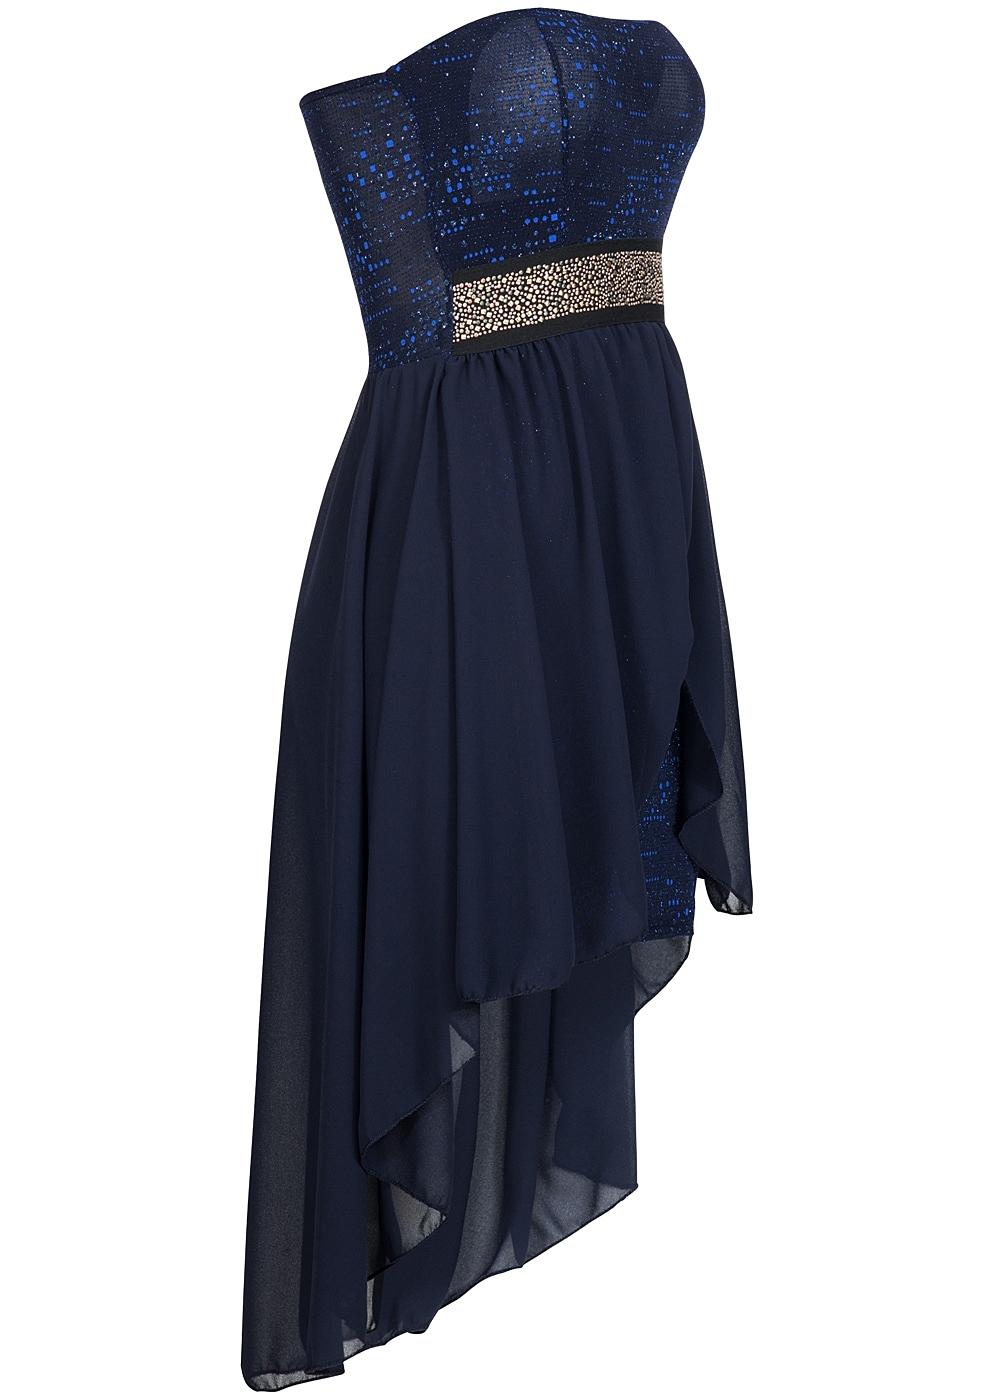 styleboom fashion damen partykleid bandeau vokuhila glitzer royal blau 77onlineshop. Black Bedroom Furniture Sets. Home Design Ideas